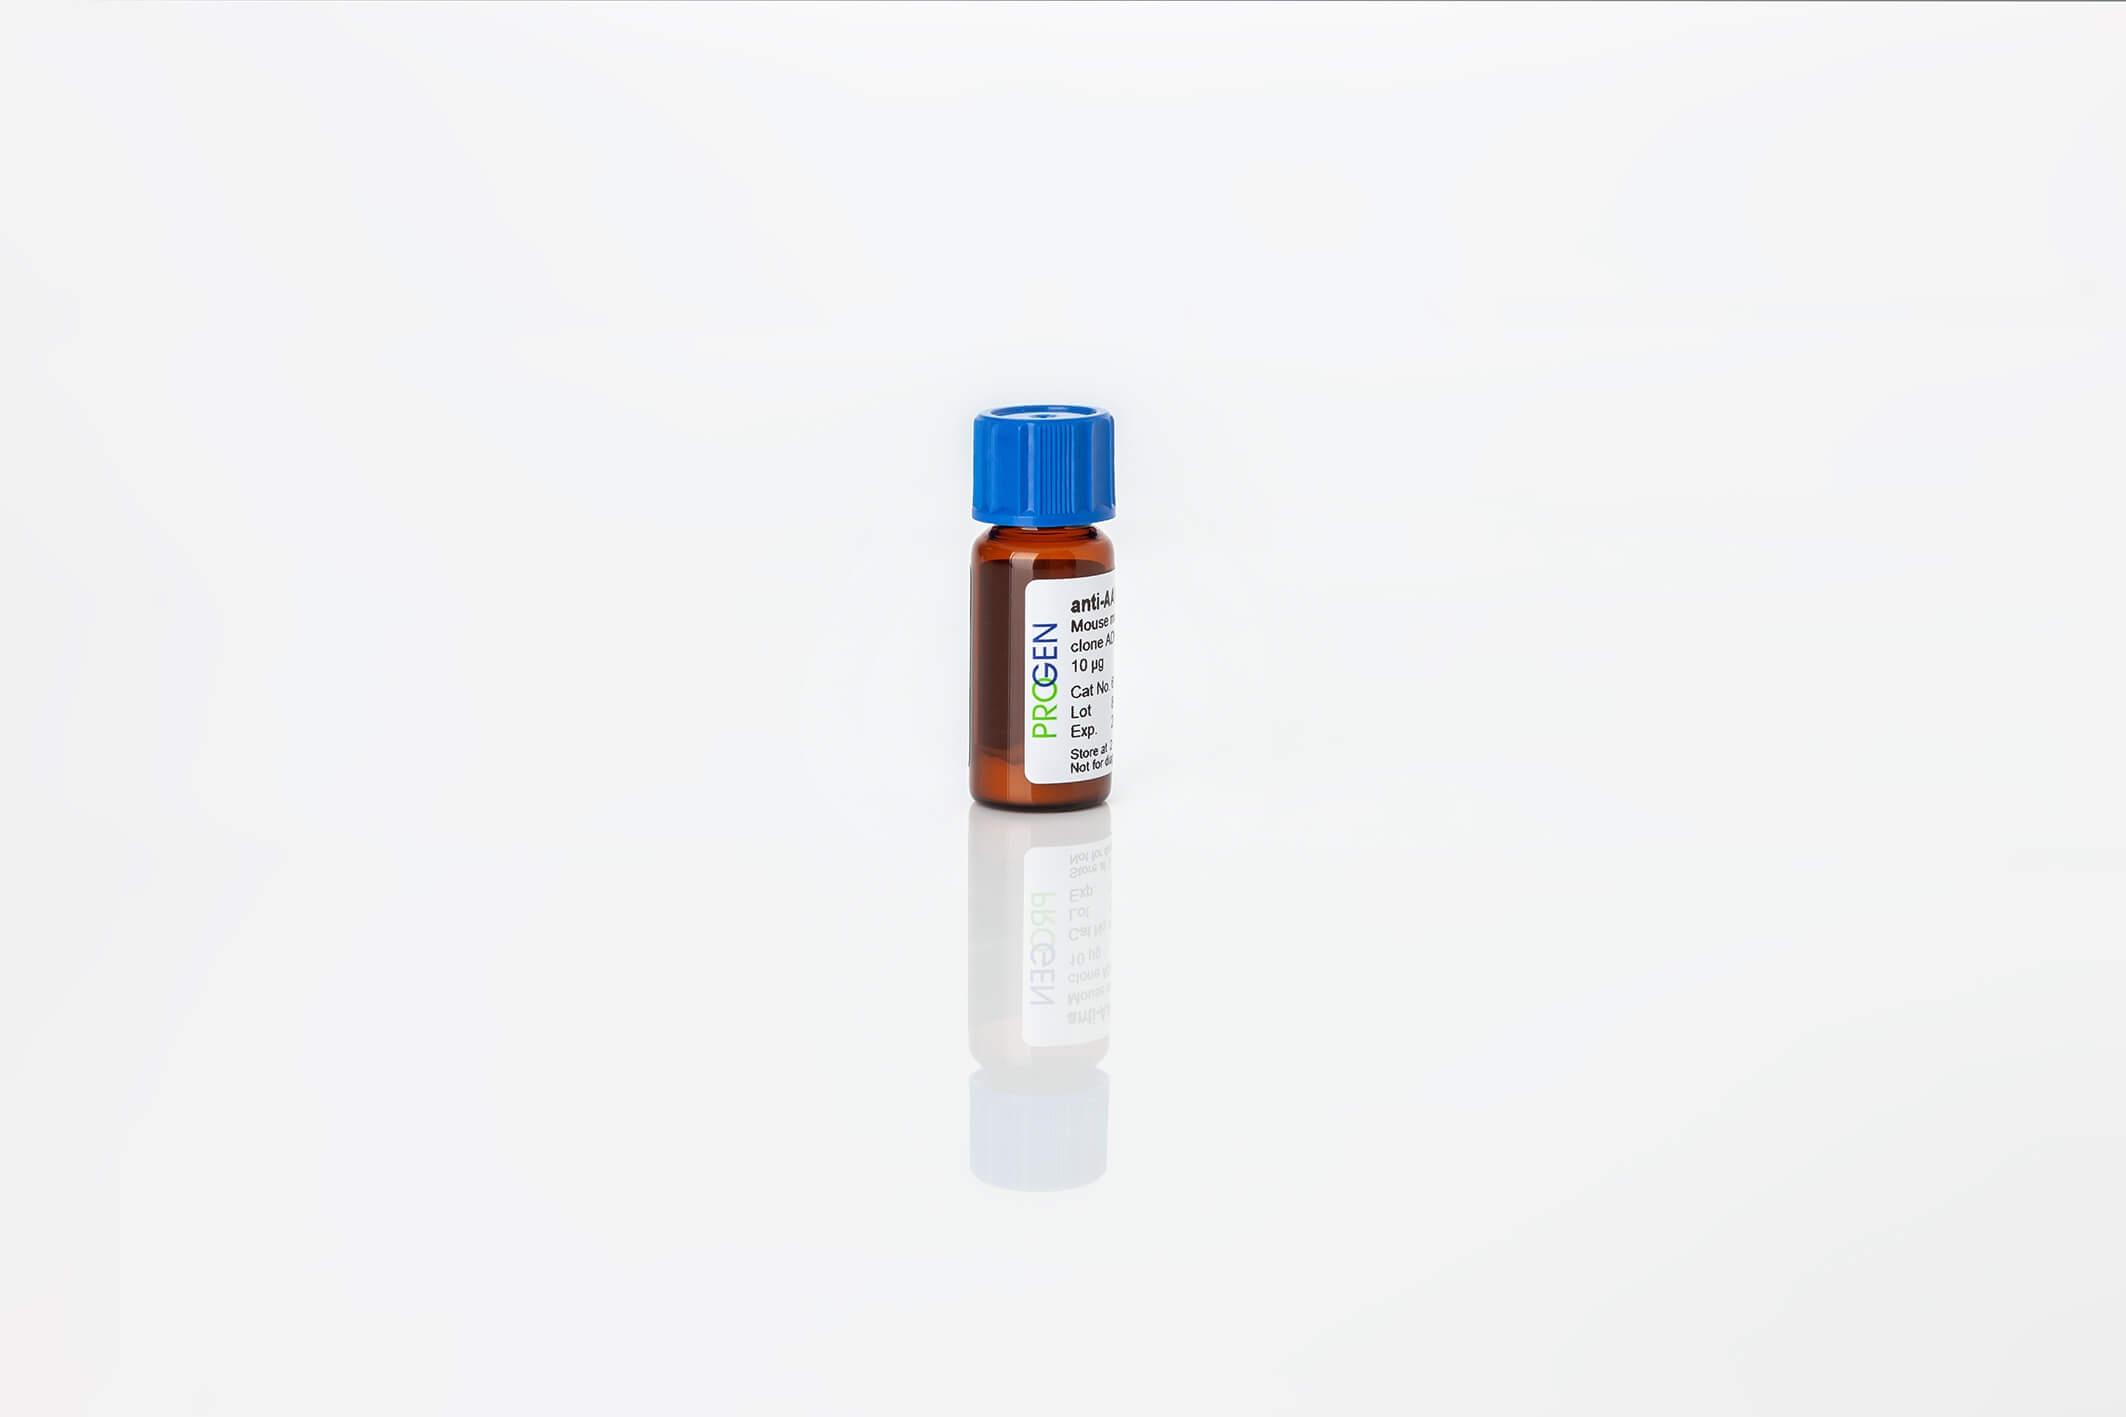 anti-Vimentin guinea pig polyclonal, serum